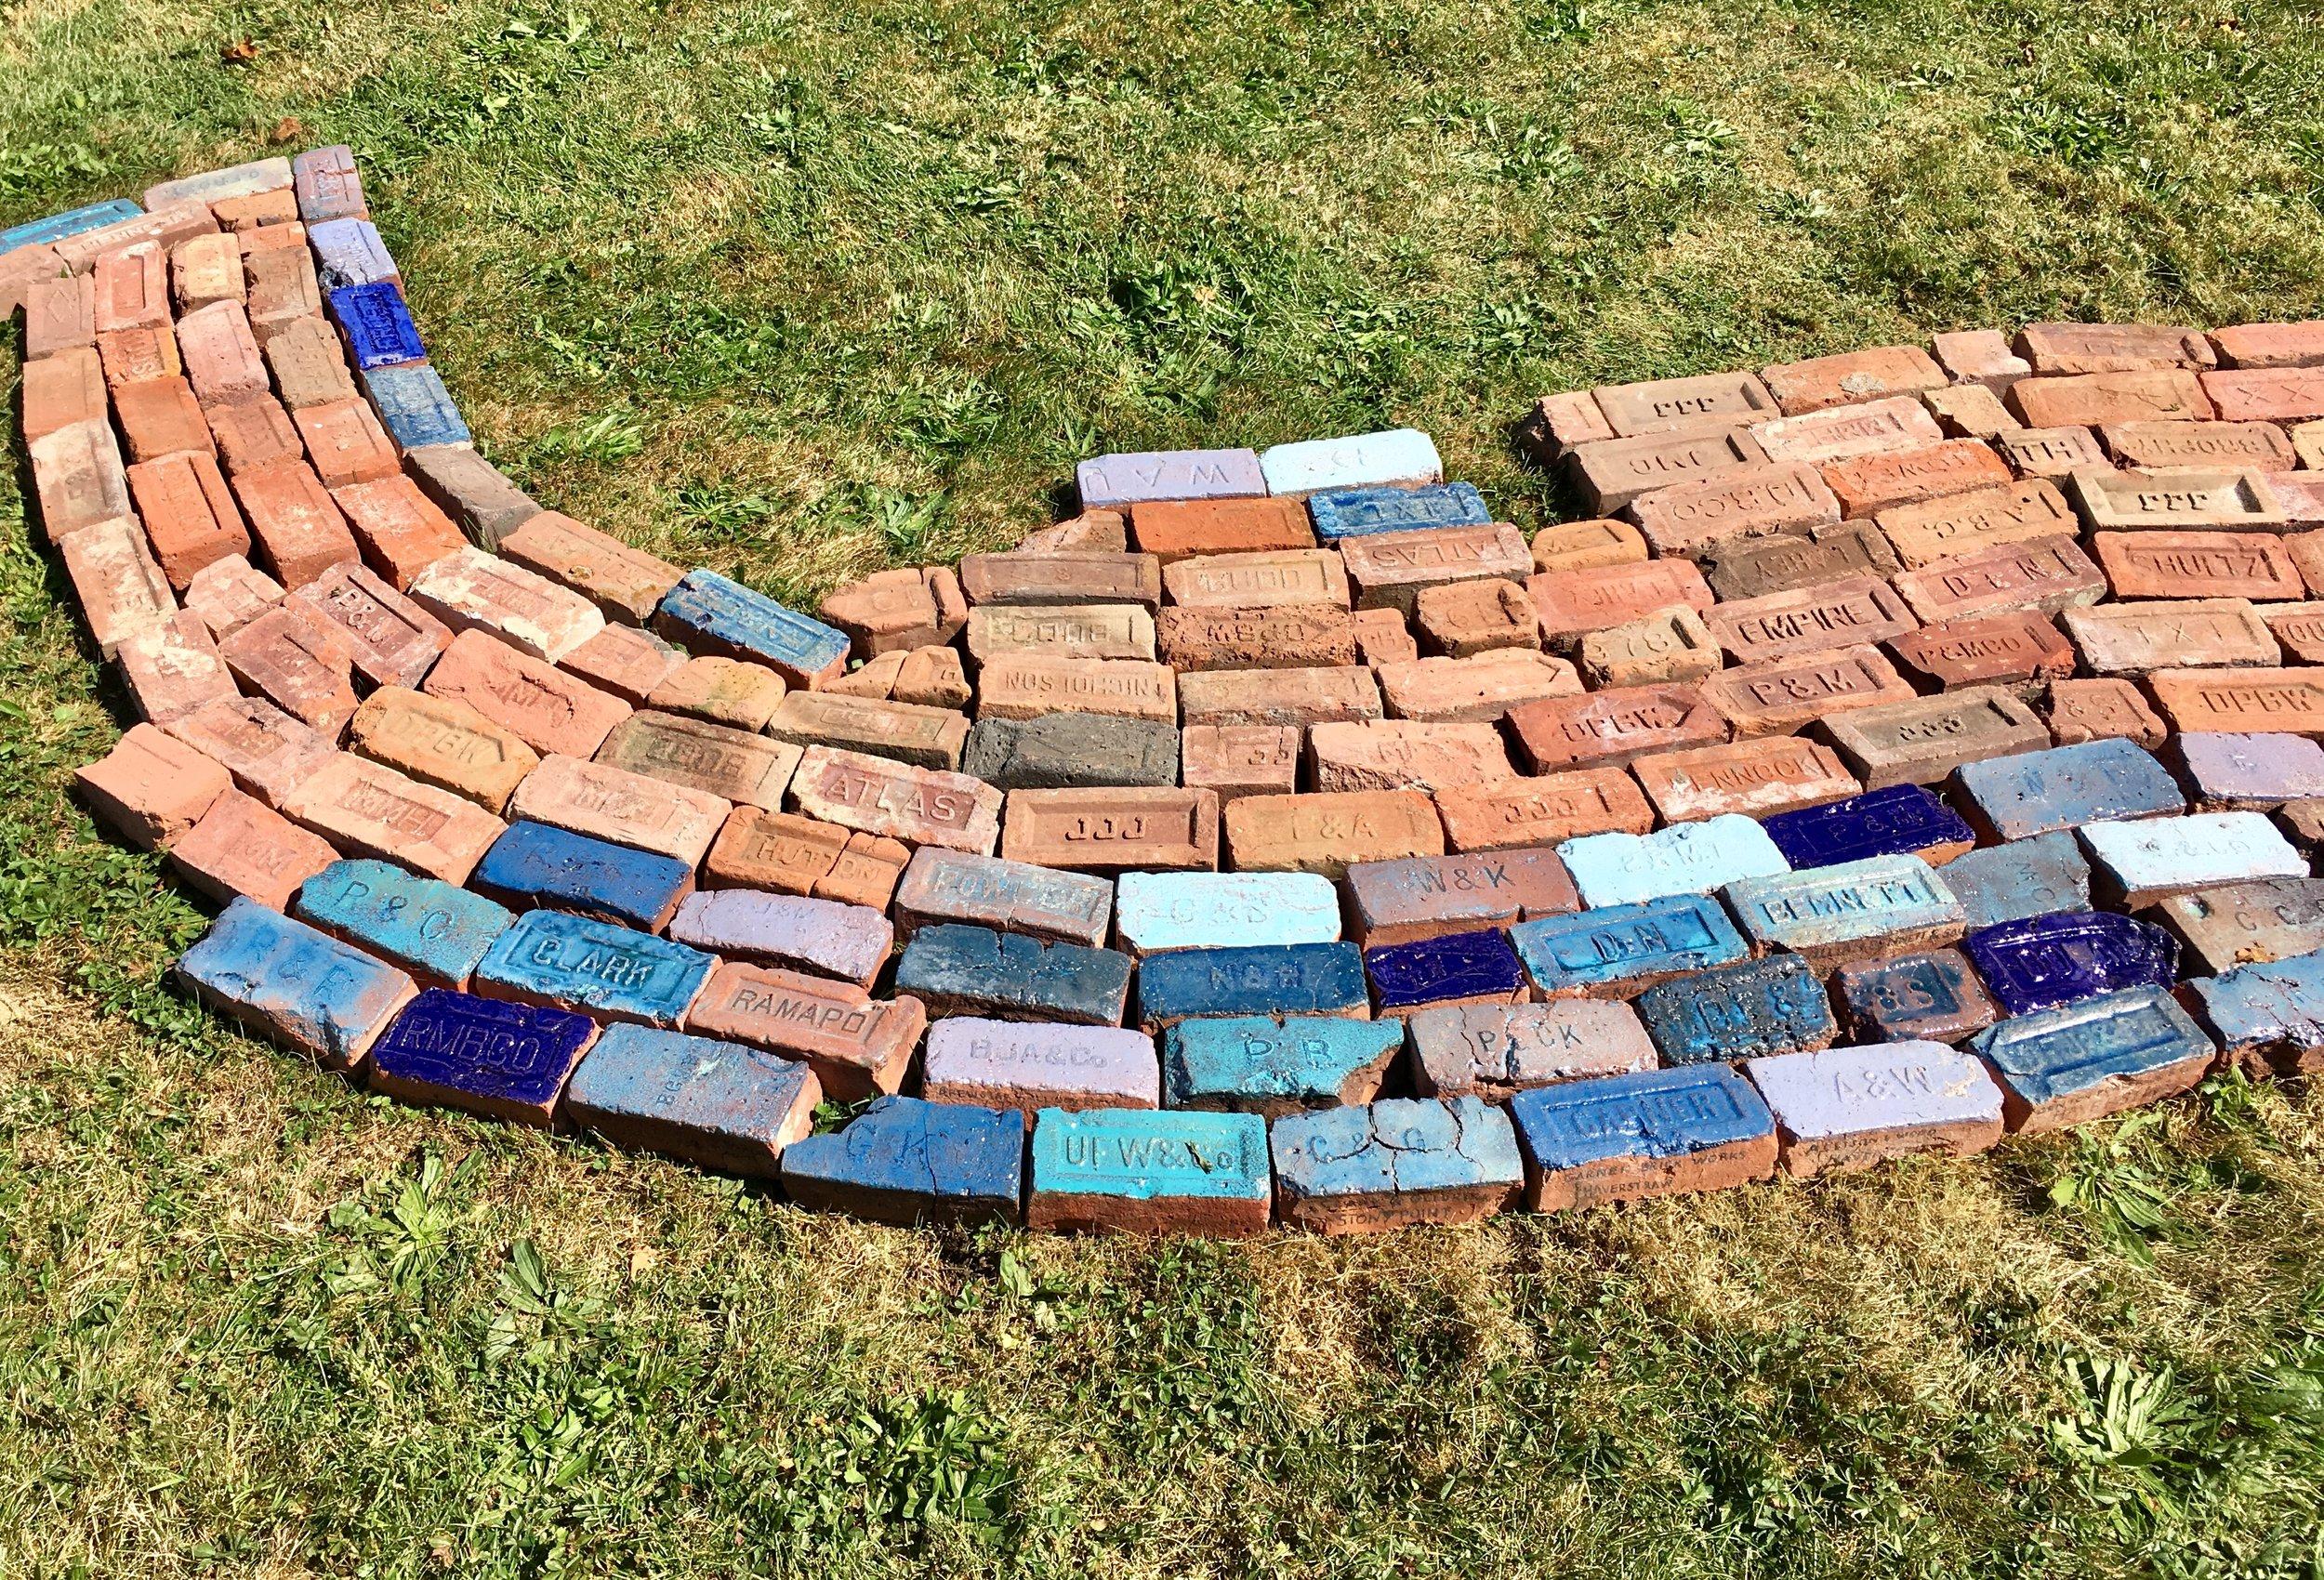 Hudson River of Bricks